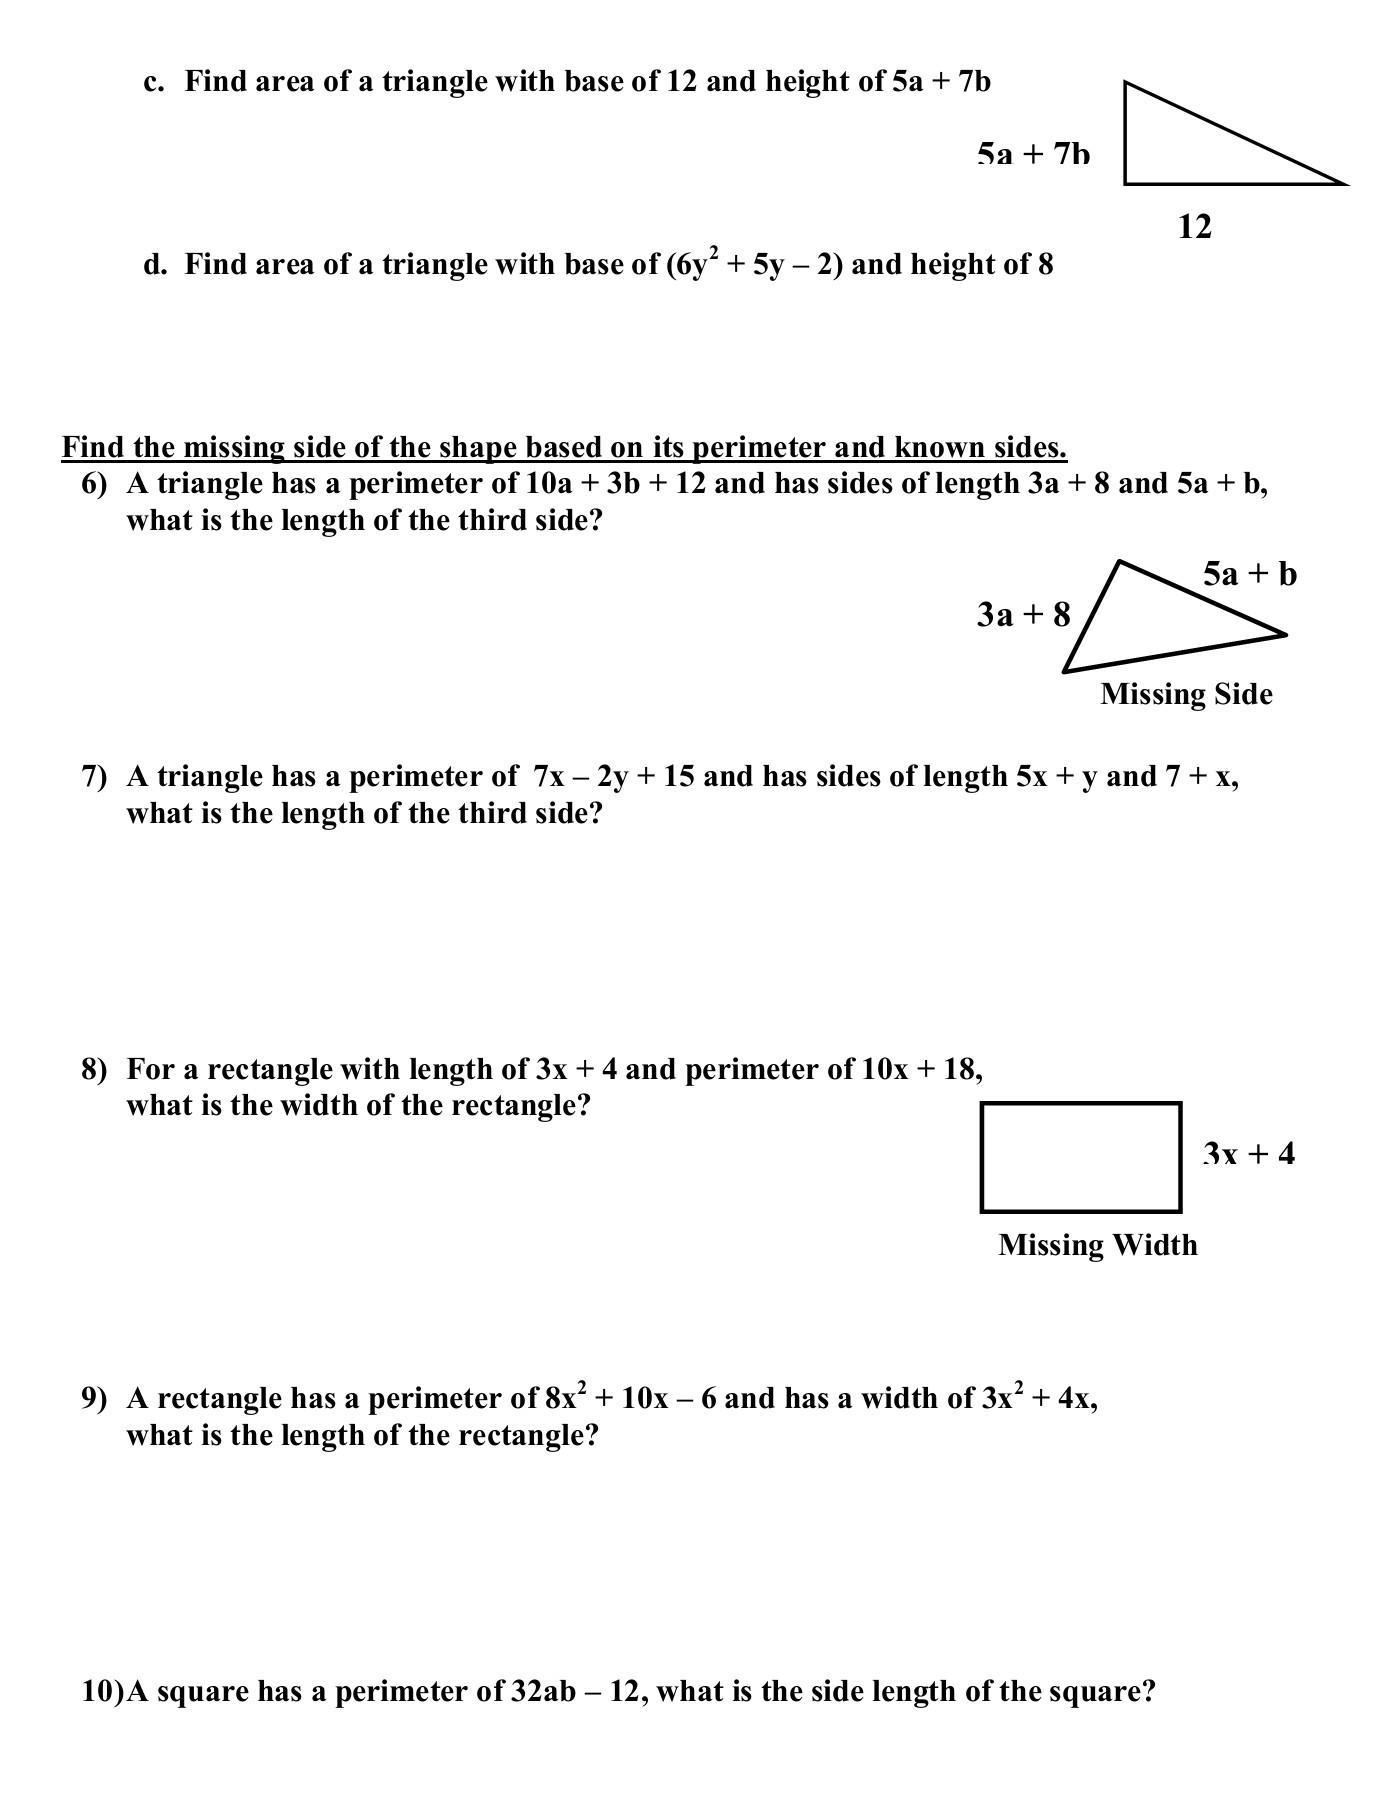 Combining Like Terms Practice Worksheet Bining Like Terms Worksheet with Answers Nidecmege